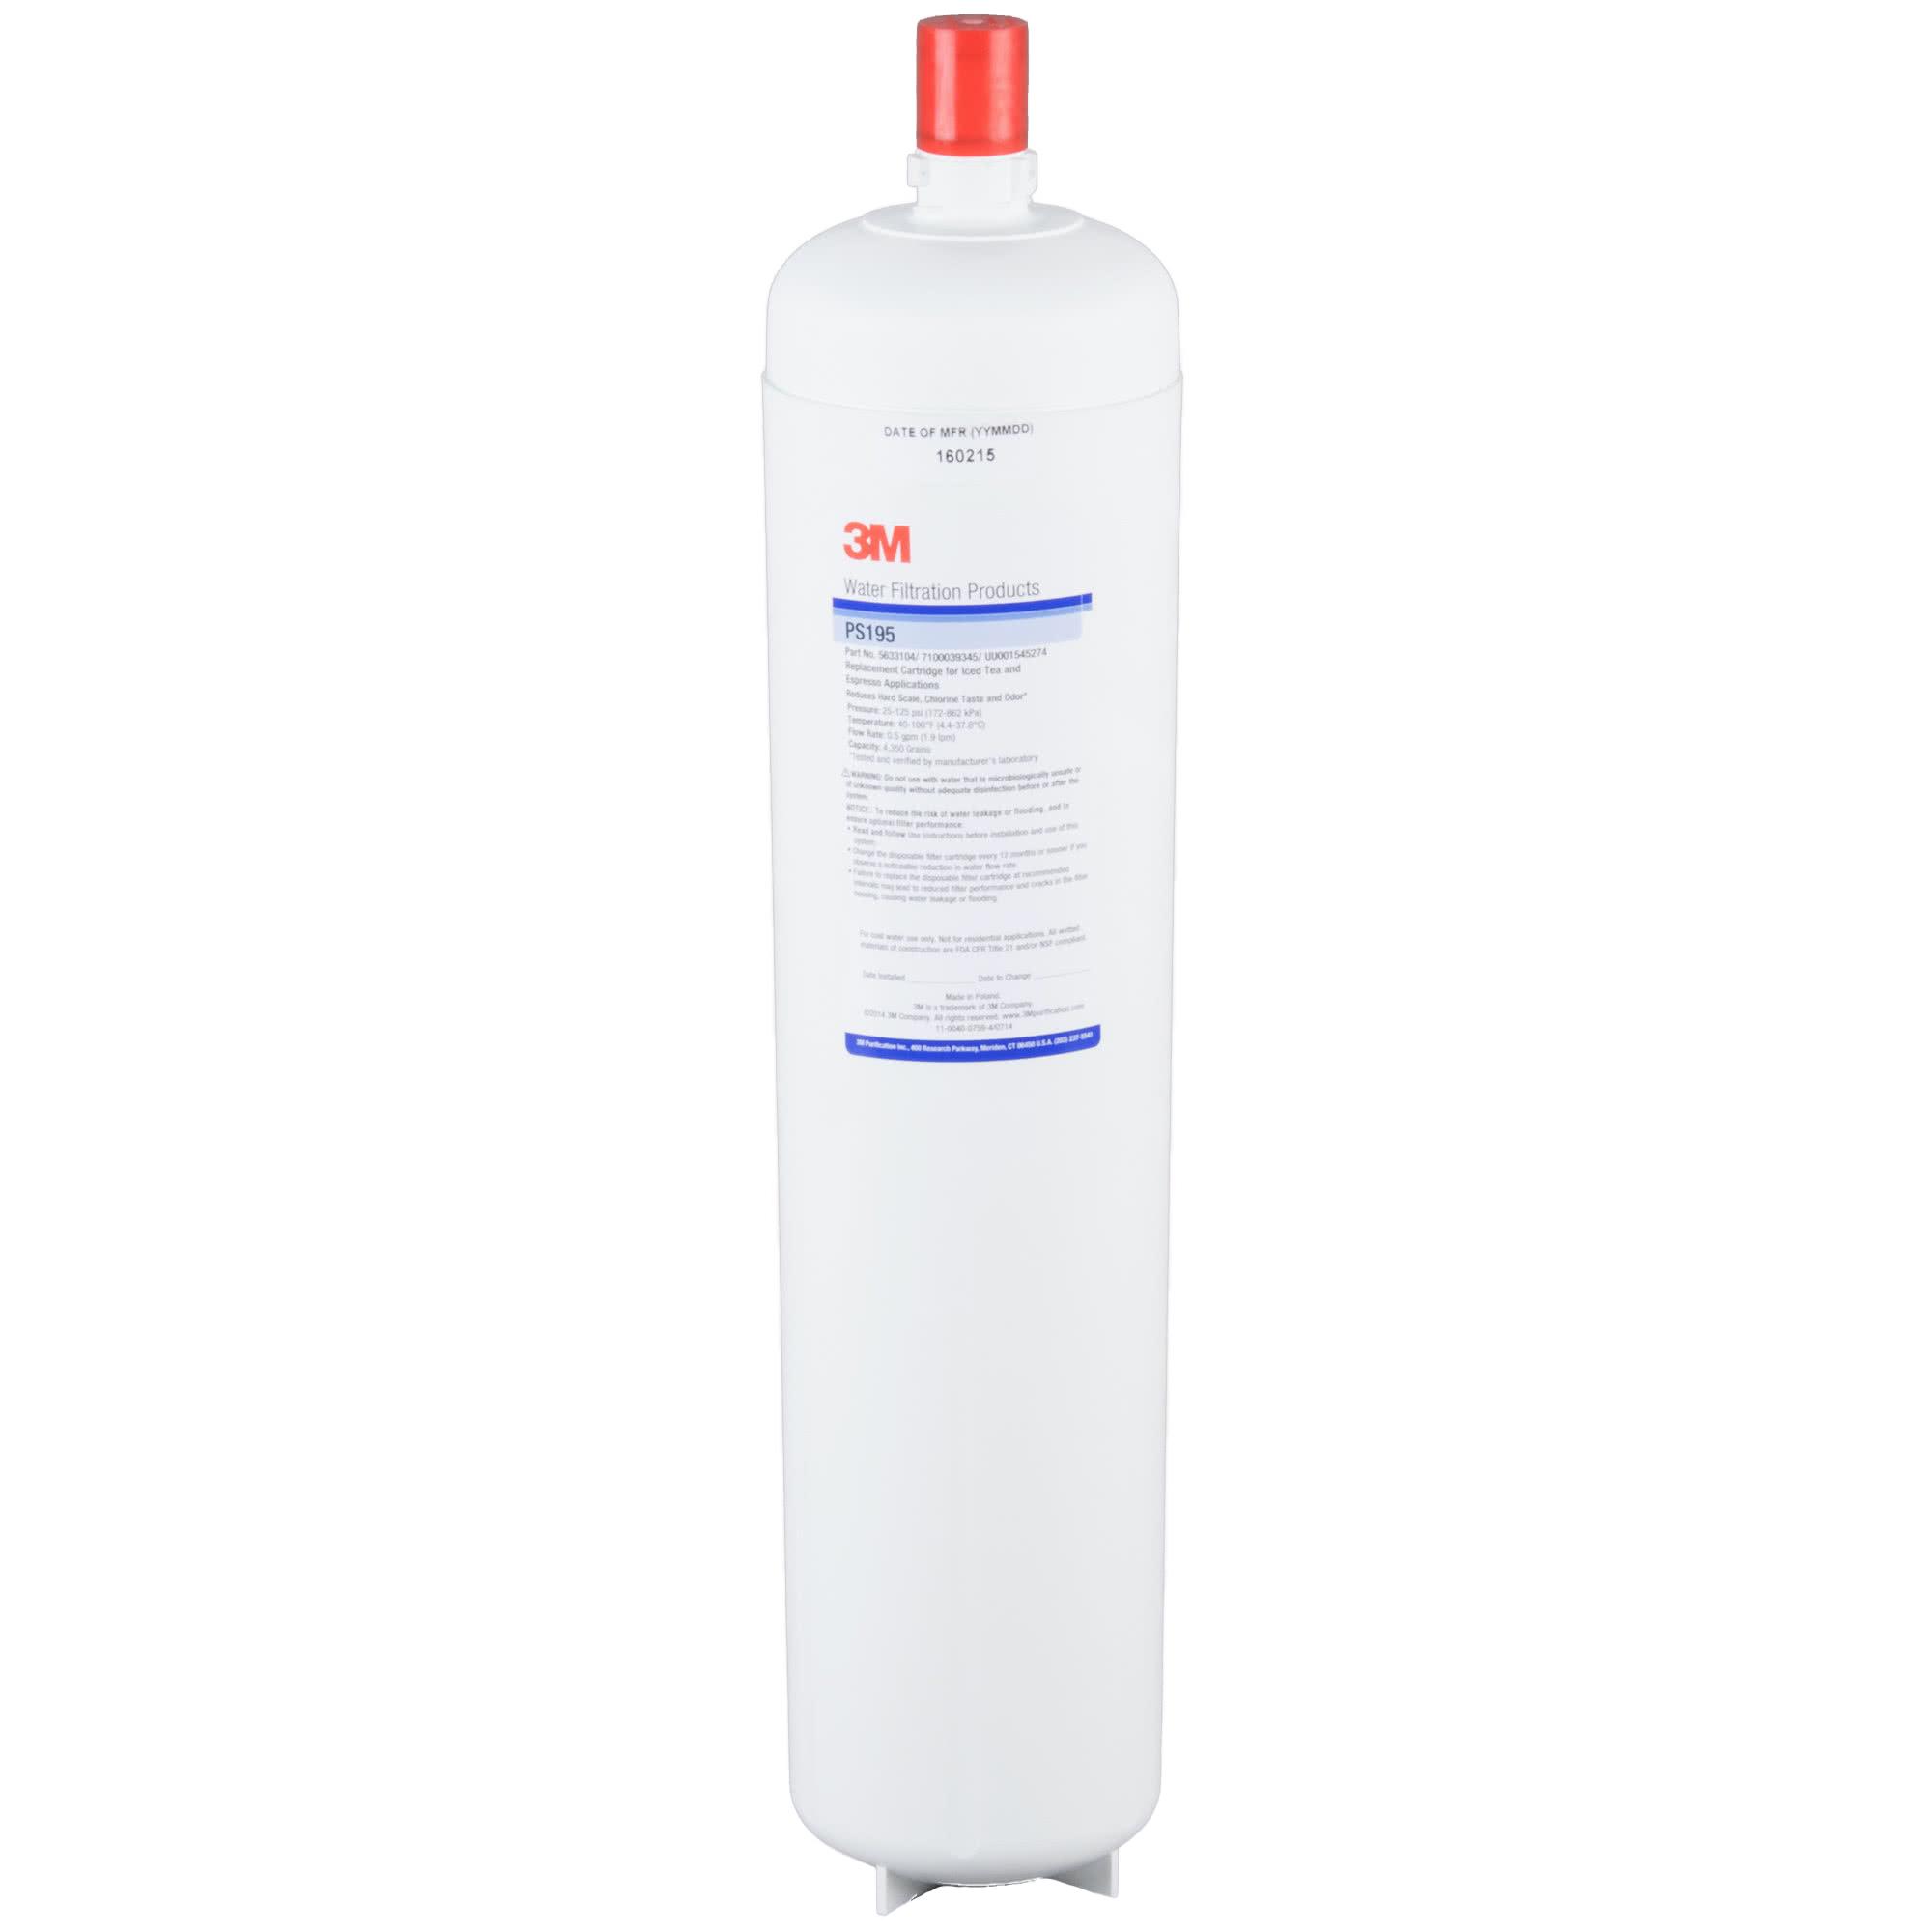 3M Cuno PS195 Retrofit Scale, Chlorine Taste and Odor Reduction Cartridge